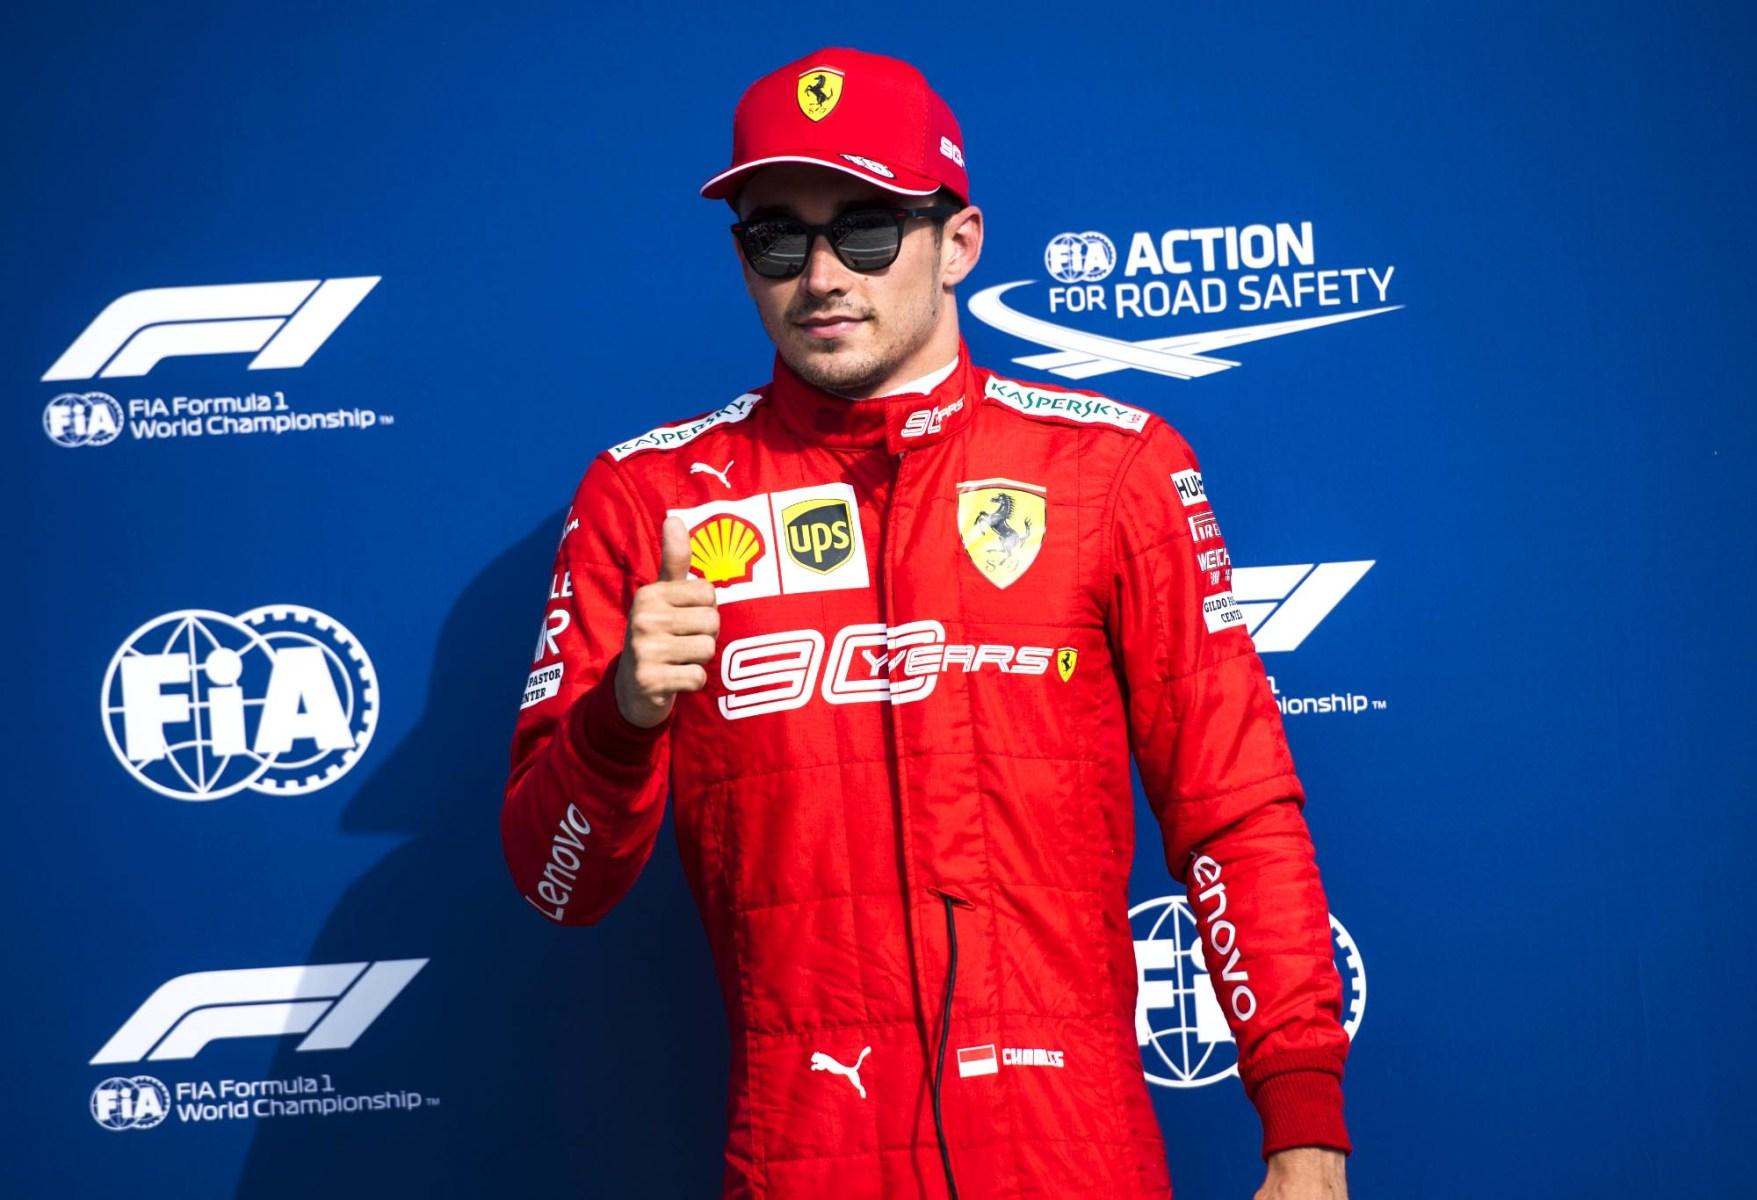 Charles Leclerc celebrates at the Italian Grand Prix